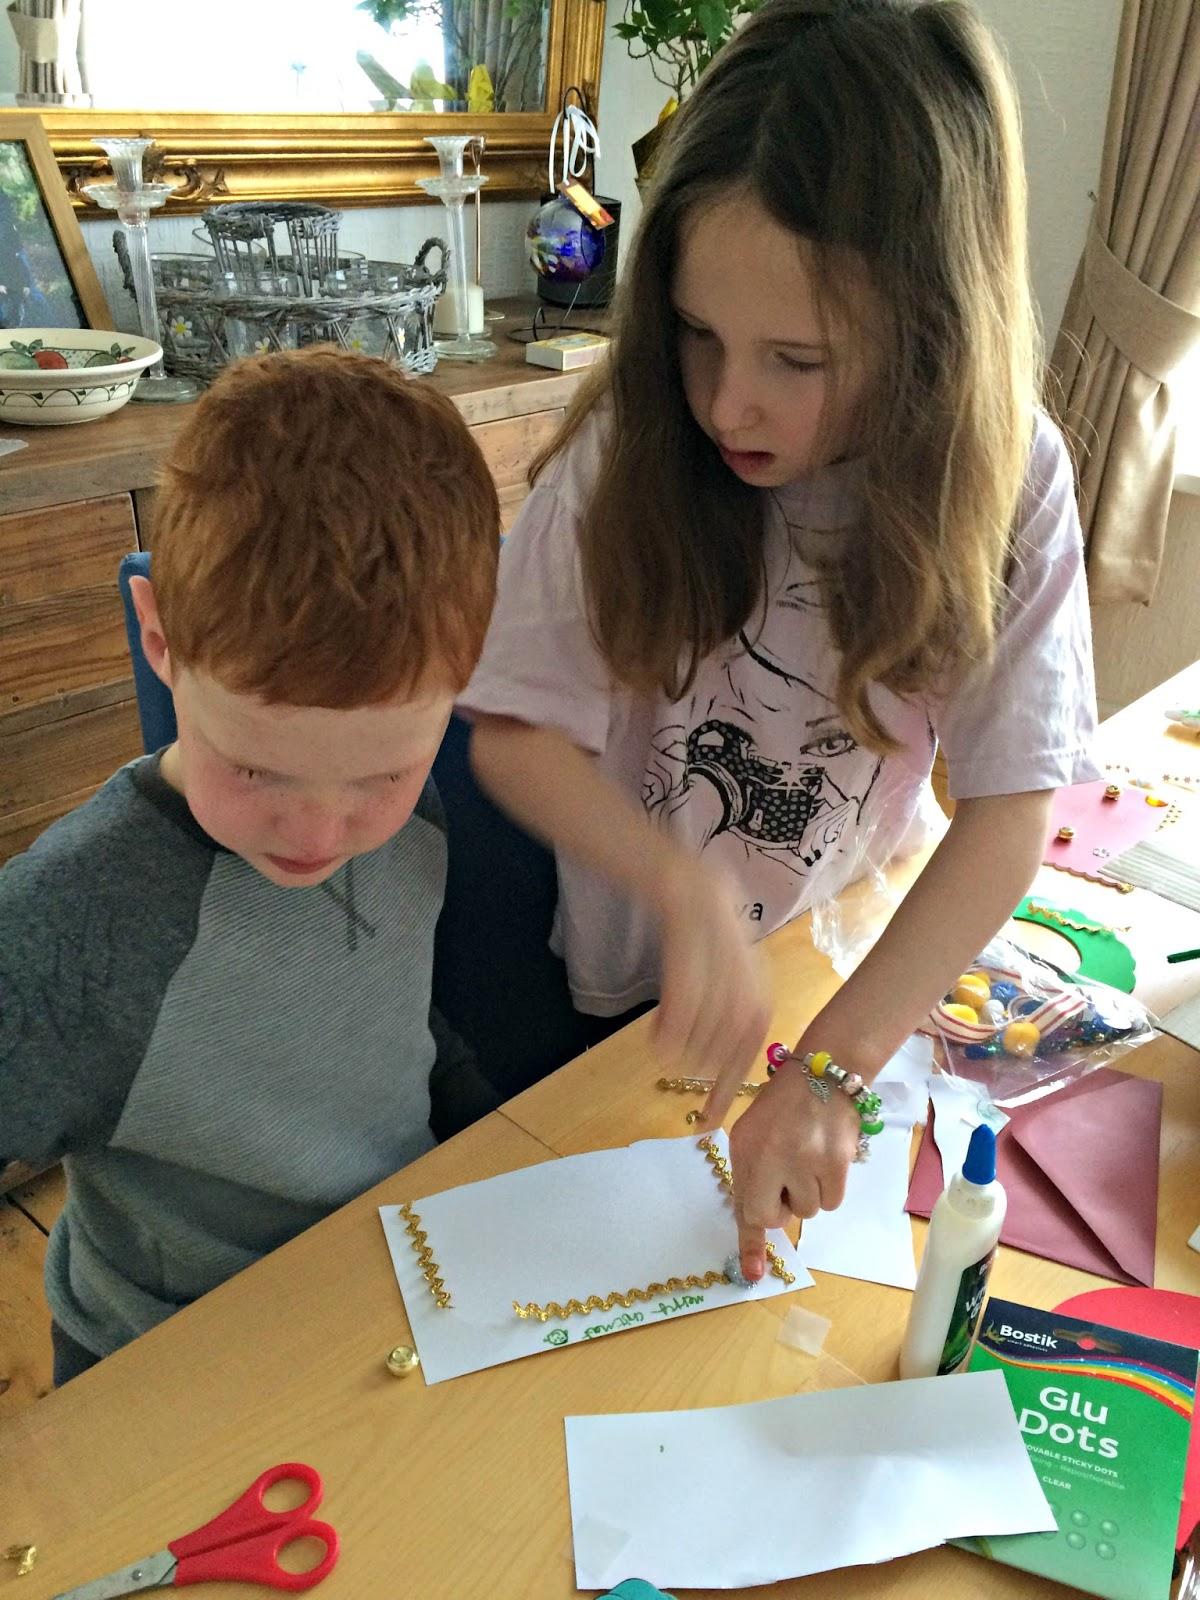 Caitlin & Ieuan making a Christmas card together